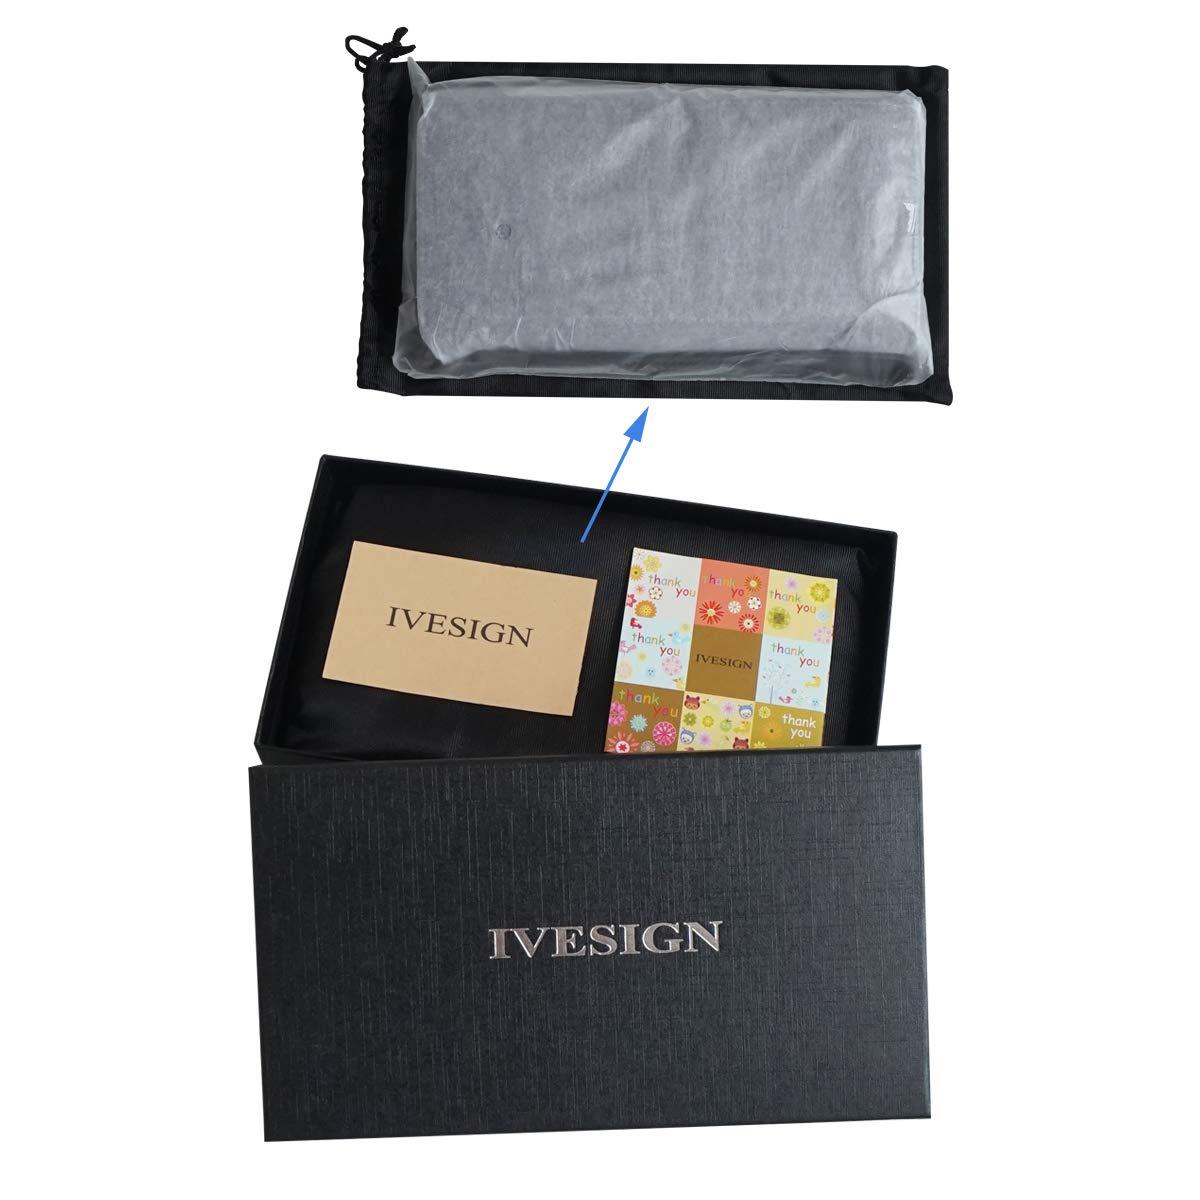 IVESIGN Women\'s Wax Genuine Leather Wallet RFID Blocking Credit Card Holder Organizer Purse With Wristlet (Coffee)